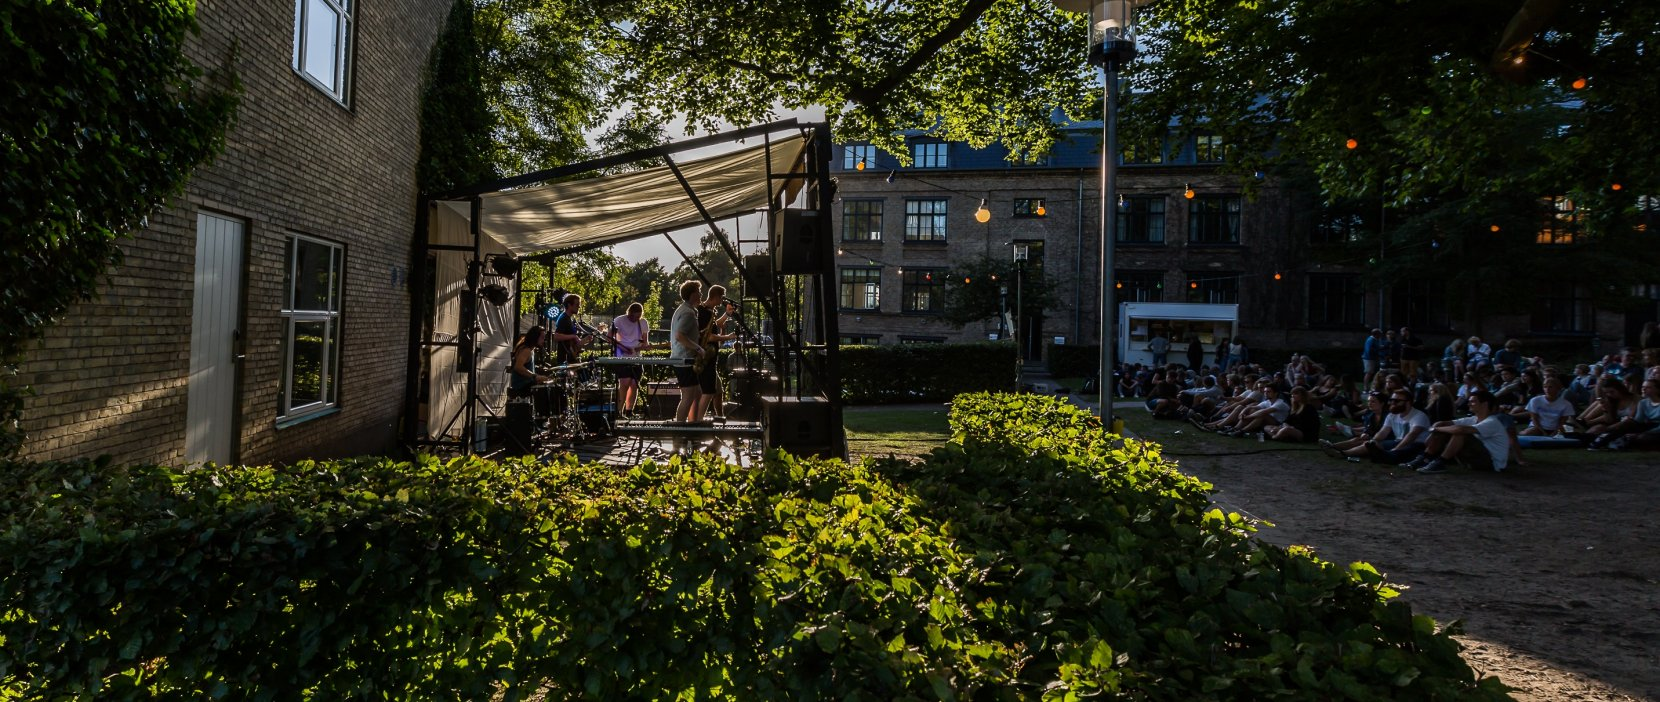 Lyd og liv i Mantzius Haven (Lydfest) - Foto: Lars Madsen